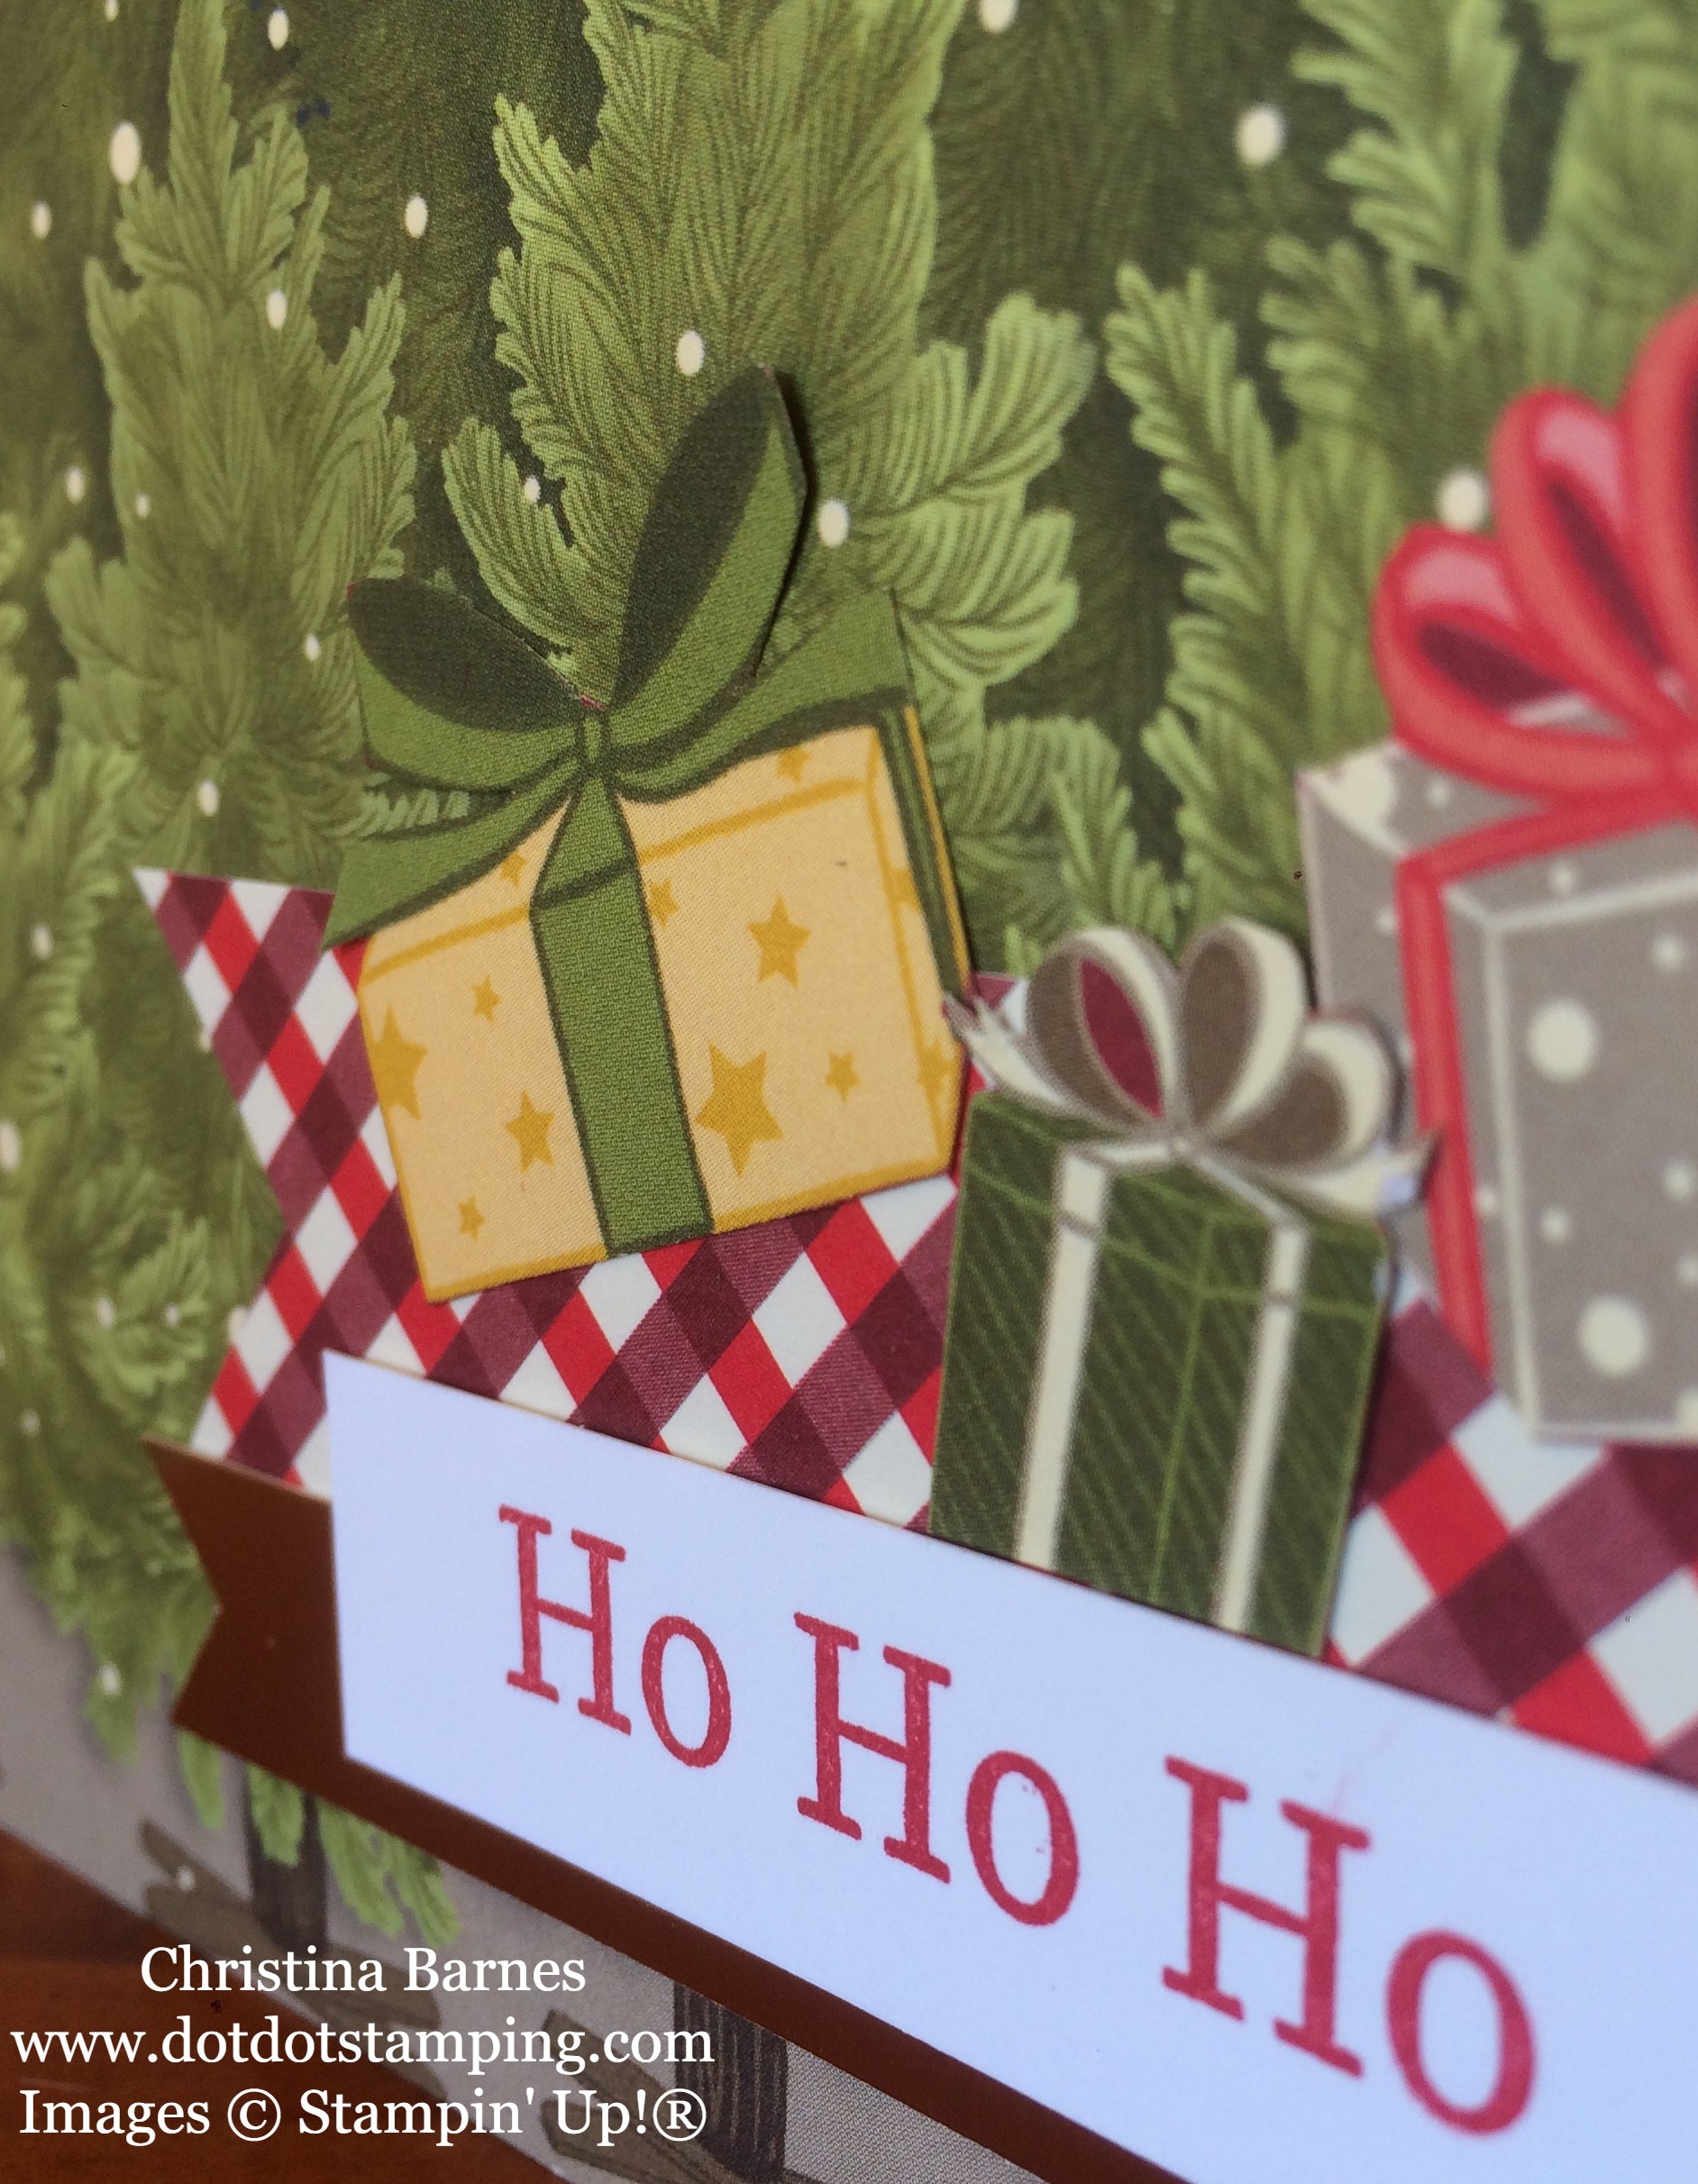 Night Before Christmas Designer Series Paper Card 2 Stampin' up! 2019 Holiday Catalogue Christina Barnes Dot Dot Stamping